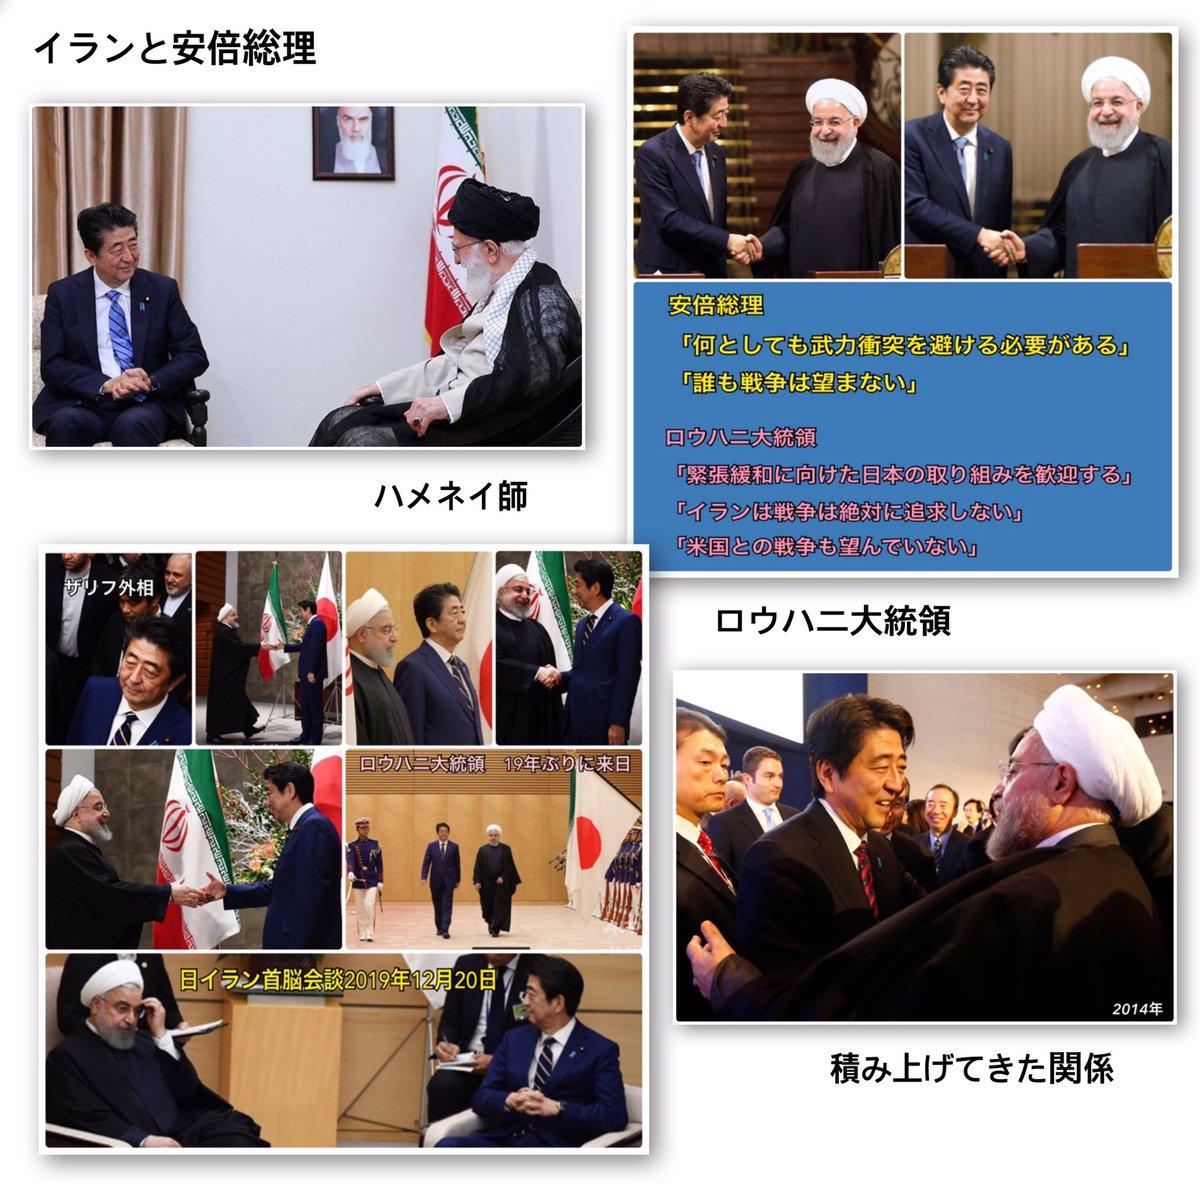 test ツイッターメディア - 河野防衛相、イラン国防相に① 日本関連船舶の航行の安全にイランの協力を求めた②海上自衛隊の中東派遣も説明声高に何でも反対、反対と言ってればいい野党と違って着々と根回し交渉に励む安倍政権現行憲法下で地道に日本が出来ることをやるしかない。米国の同盟国でこれが出来るのは日本だけ https://t.co/QUOMcTiUXp https://t.co/Bs9yPKW3Av